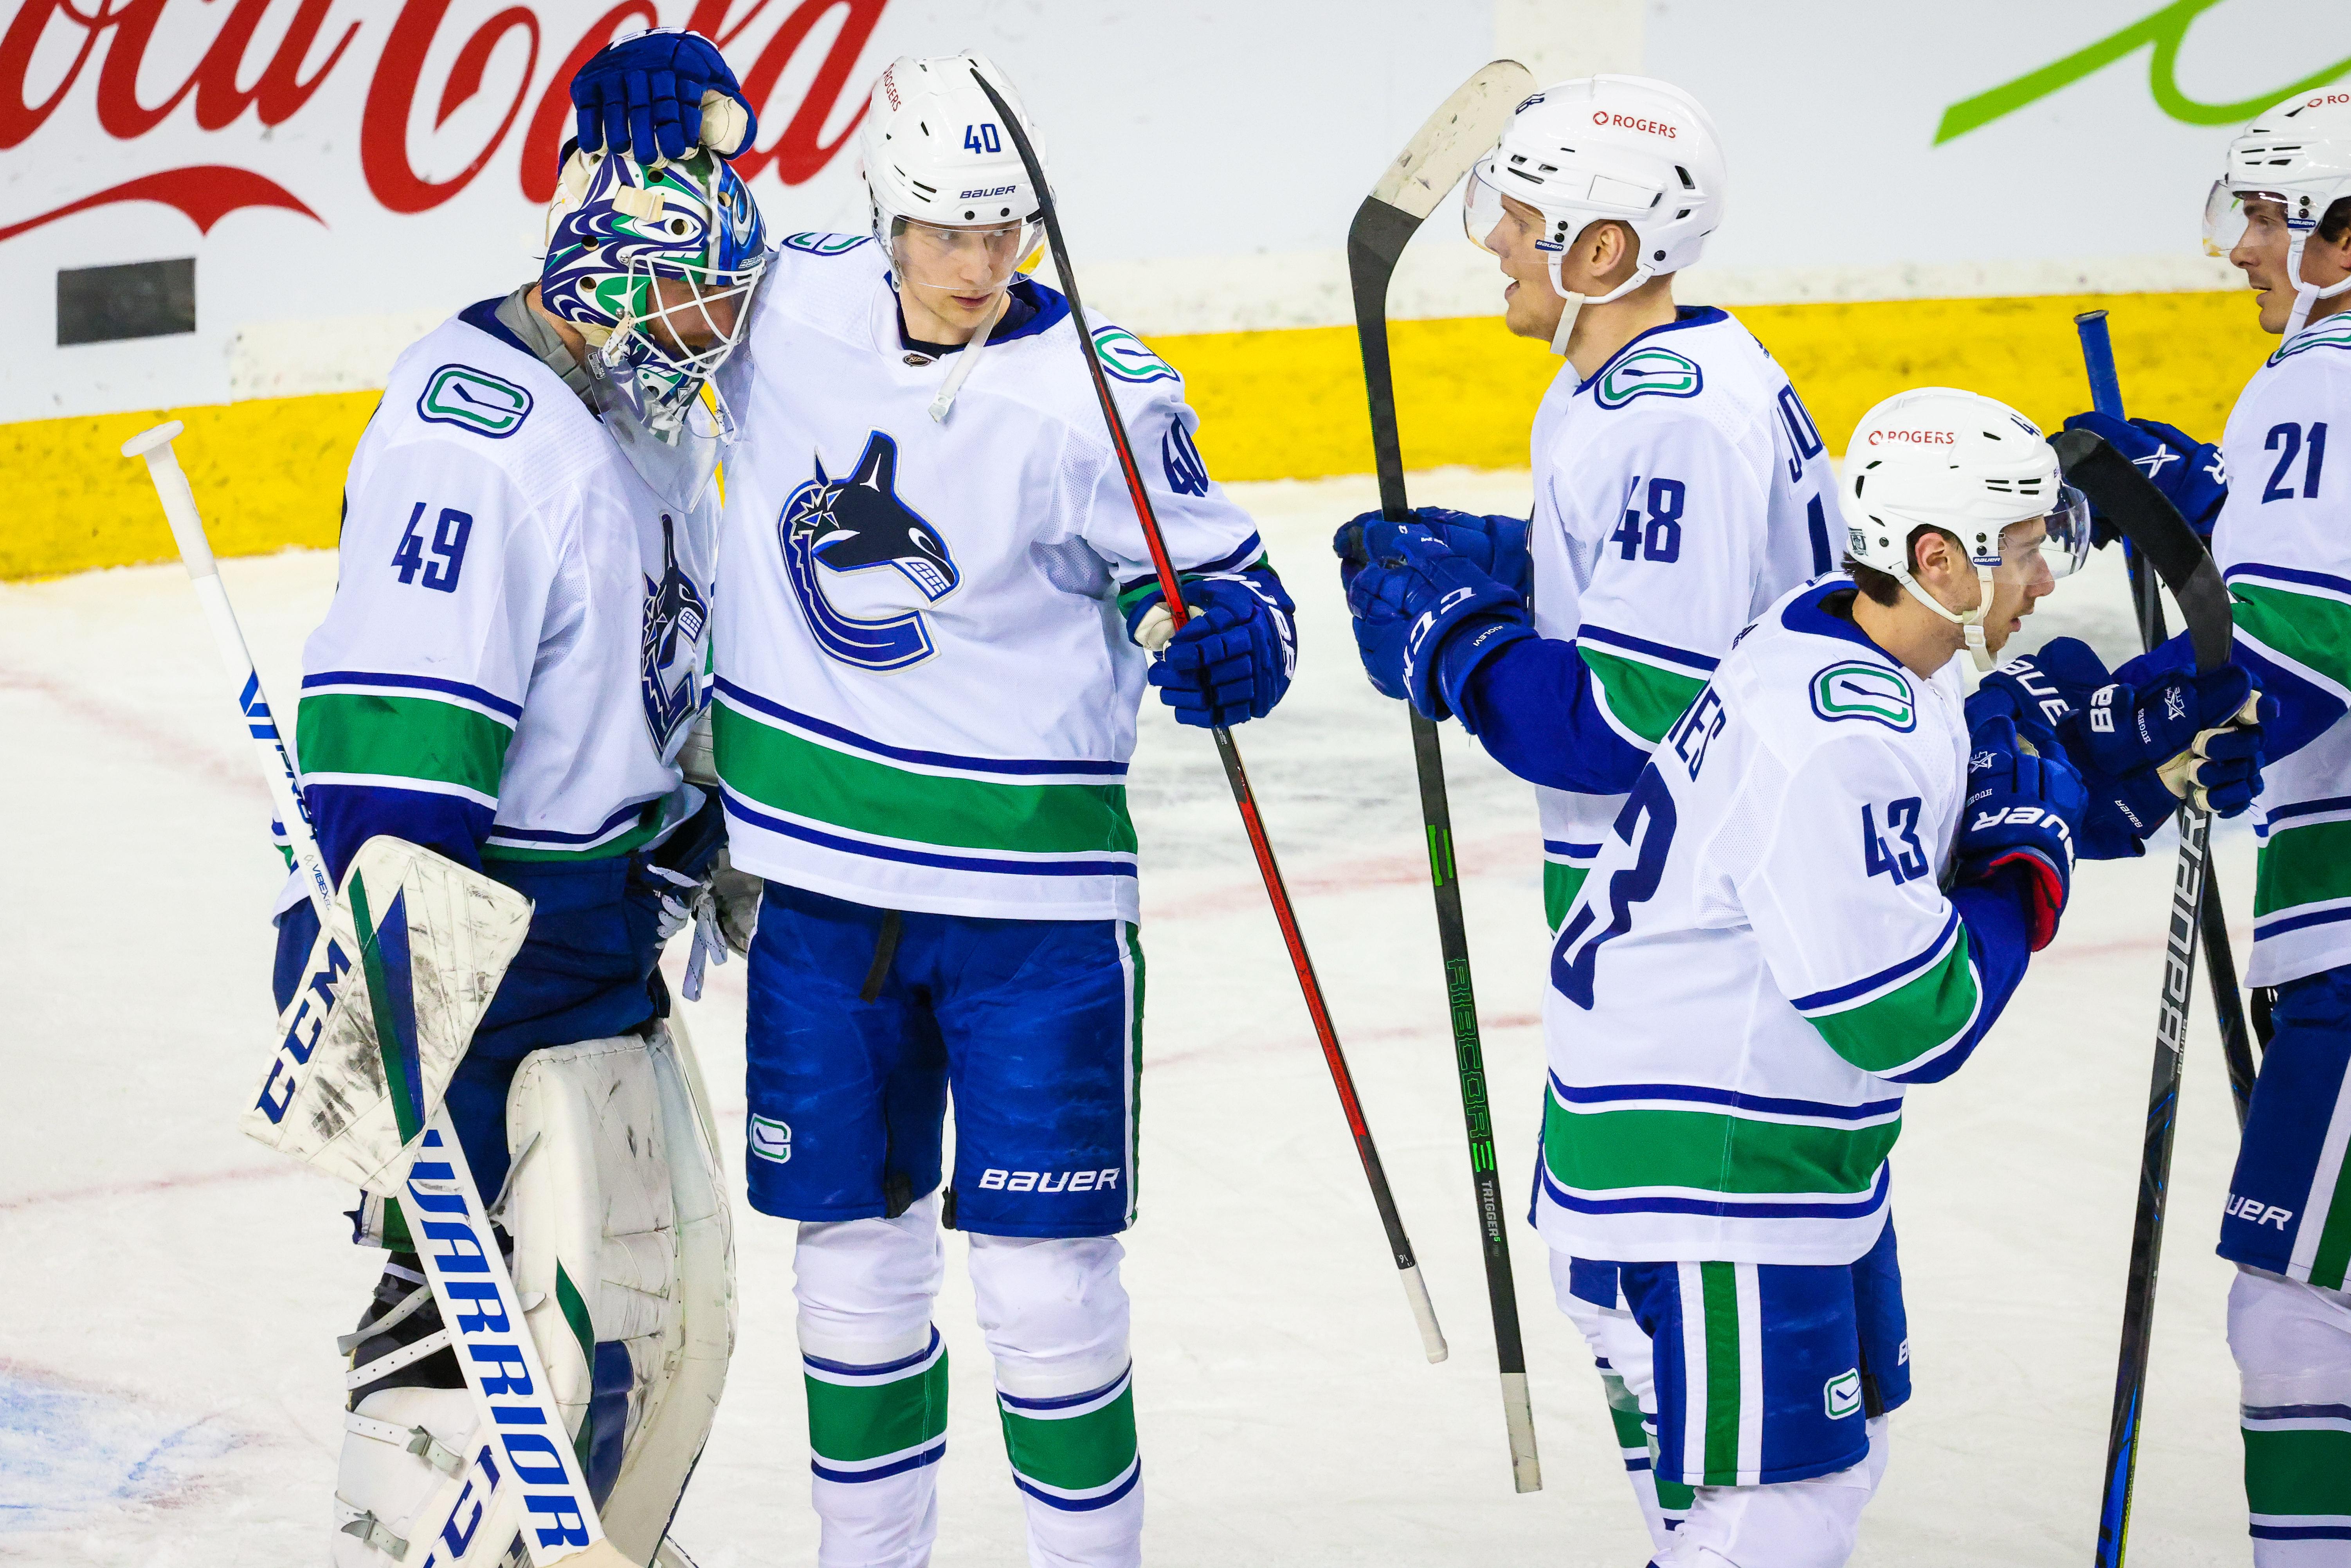 NHL: Vancouver Canucks at Calgary Flames